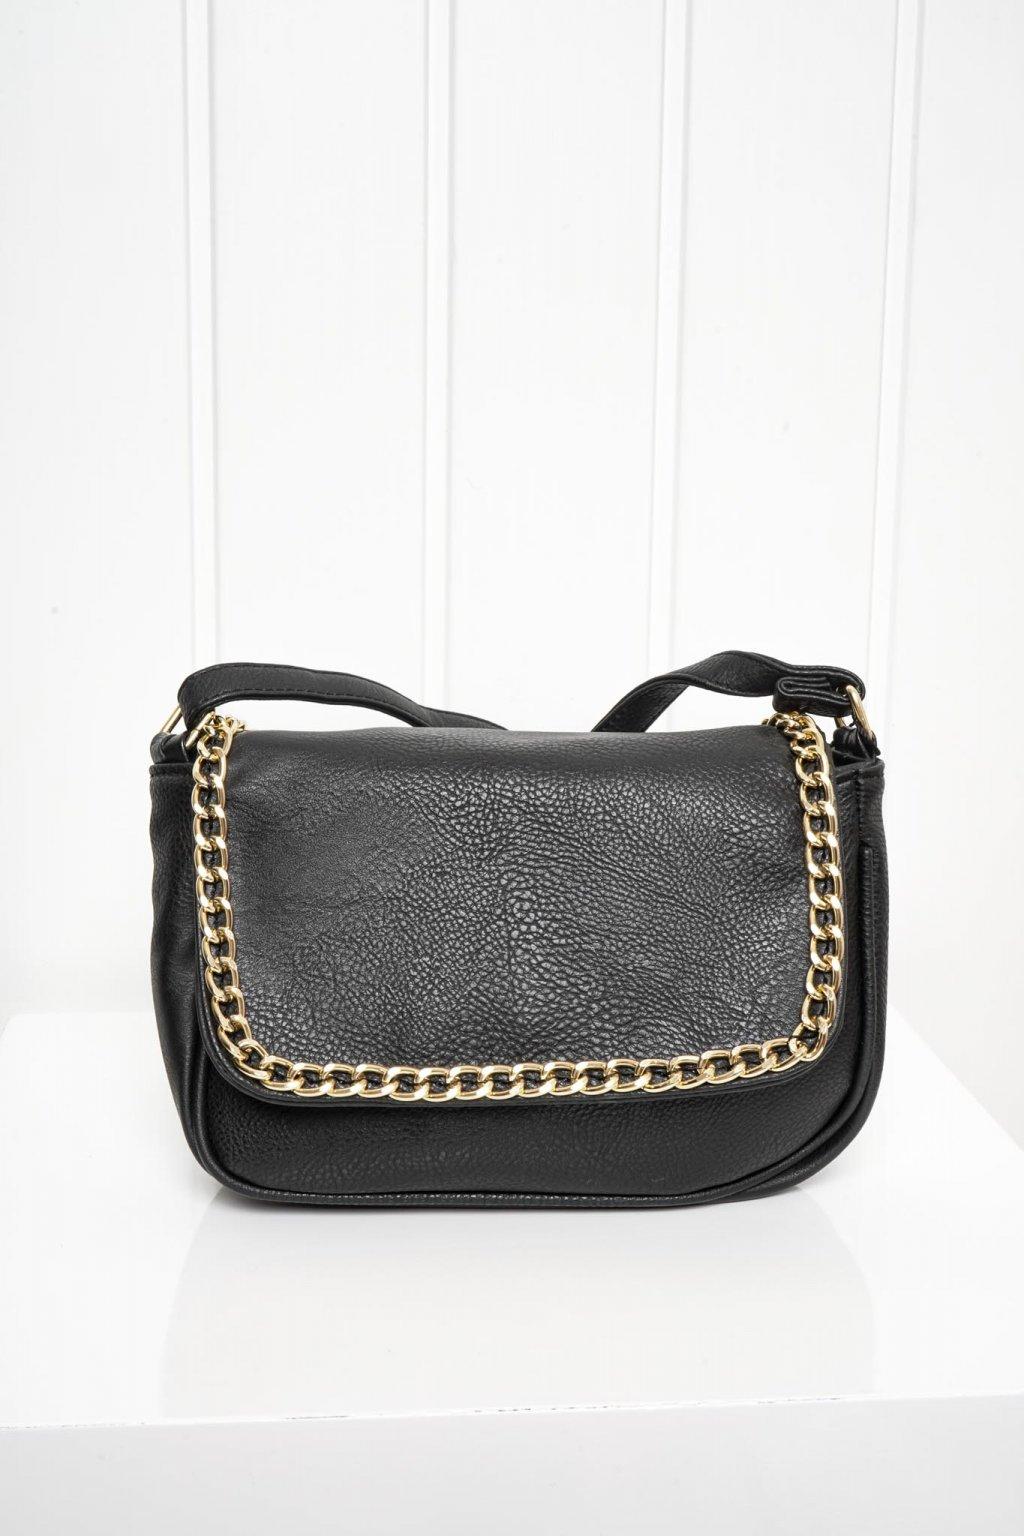 Kabelka, crossbody, ruksak, shopping bag, shopperka, 609